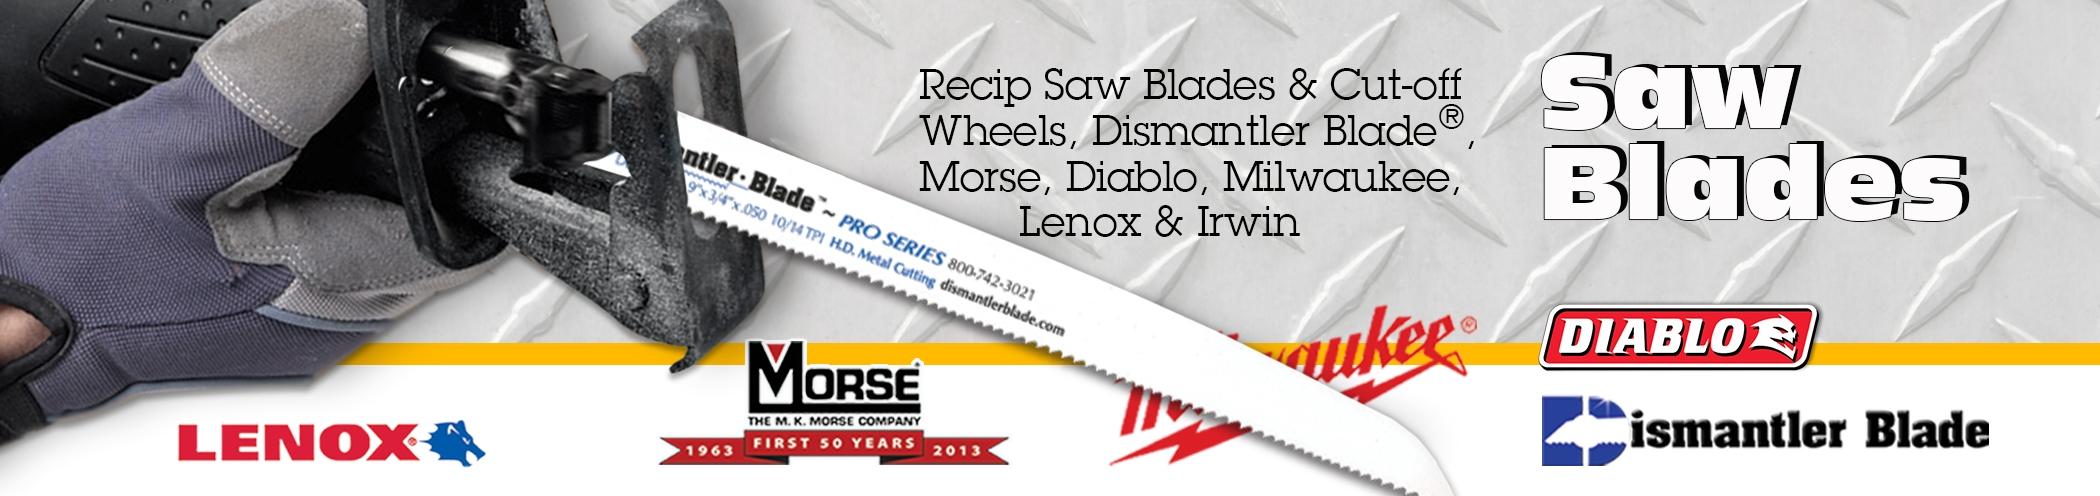 Saw Blades - Dismantling